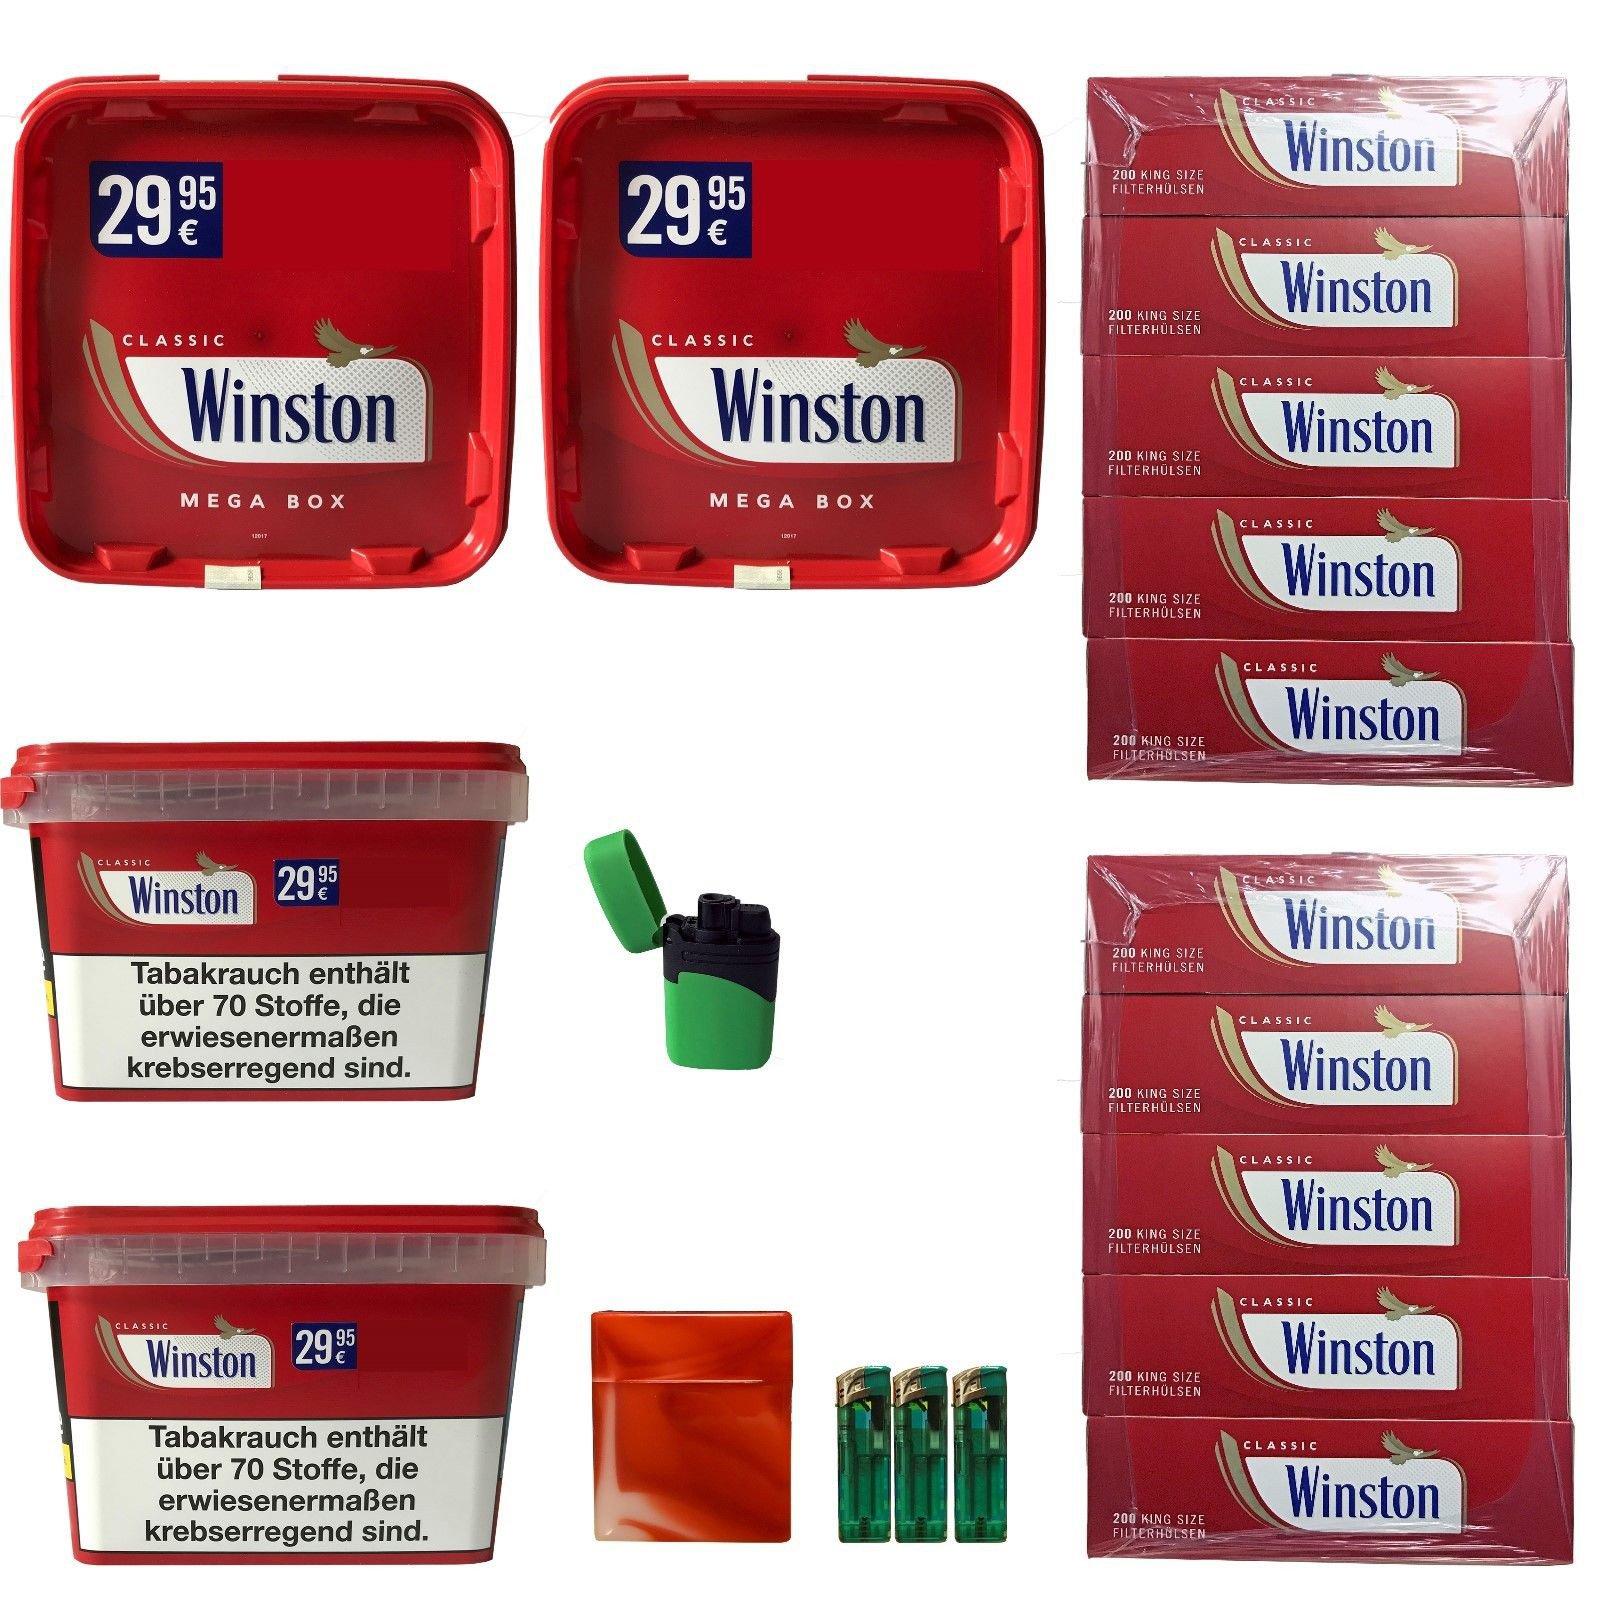 4 x Winston Tabak/Volumentabak Mega Boxes 185g, Winston Classic Hülsen + Zubehör